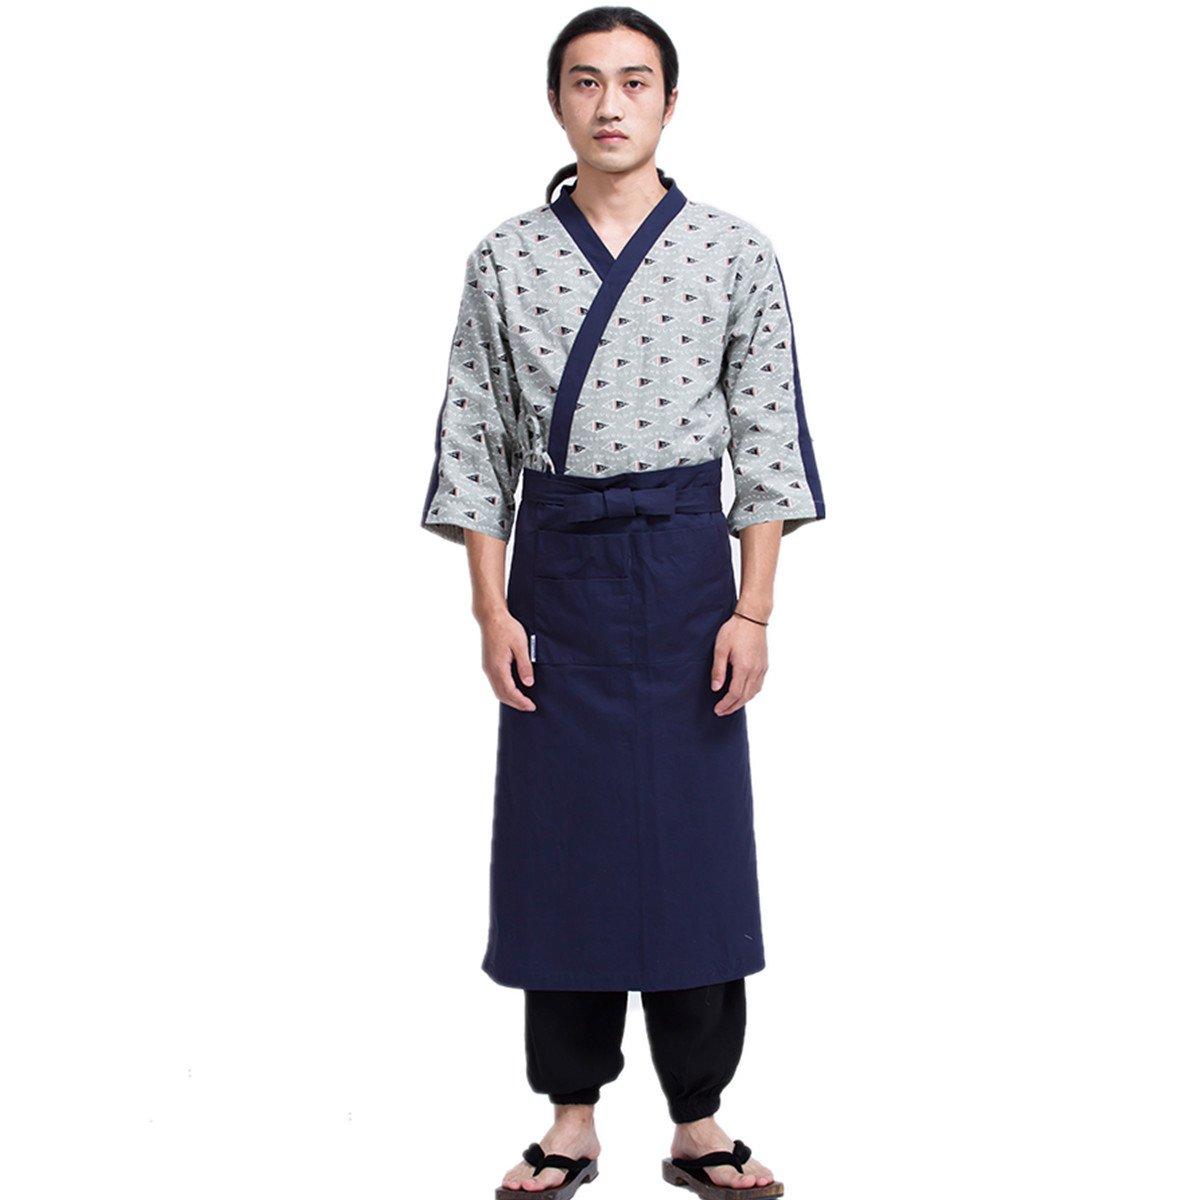 XINFU Sushi Waiter Green Fish 3/4 Long Sleeve Restaurant Japanese Kimono Kitchen Work Uniform